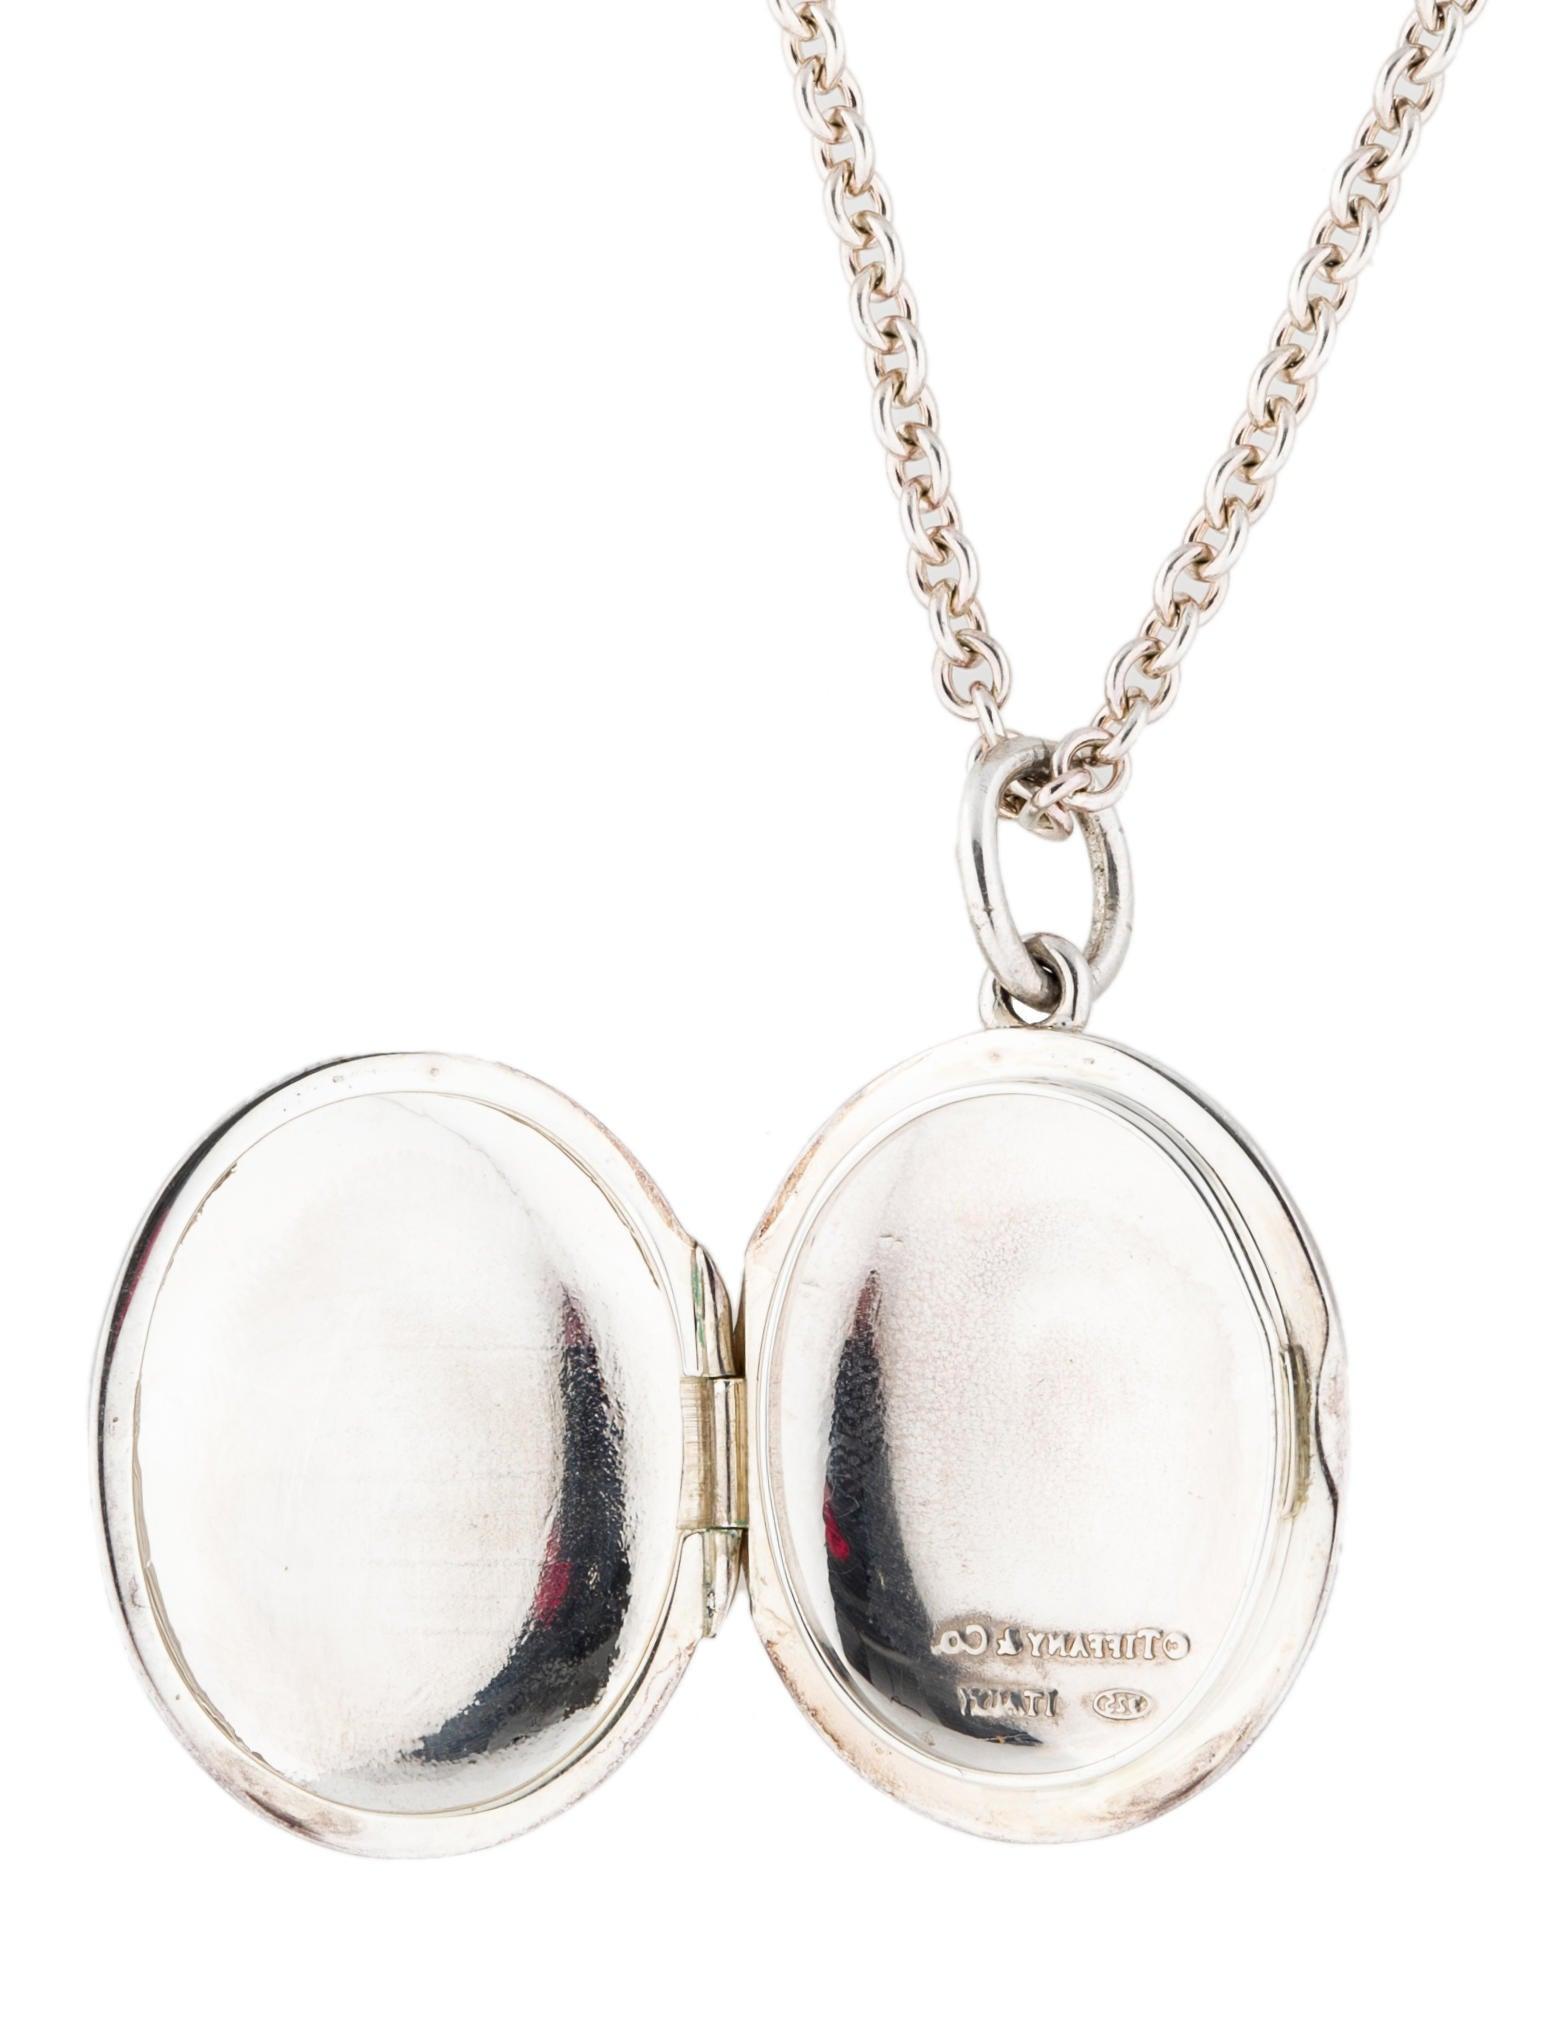 Tiffany Amp Co Oval Locket Pendant Necklace Necklaces